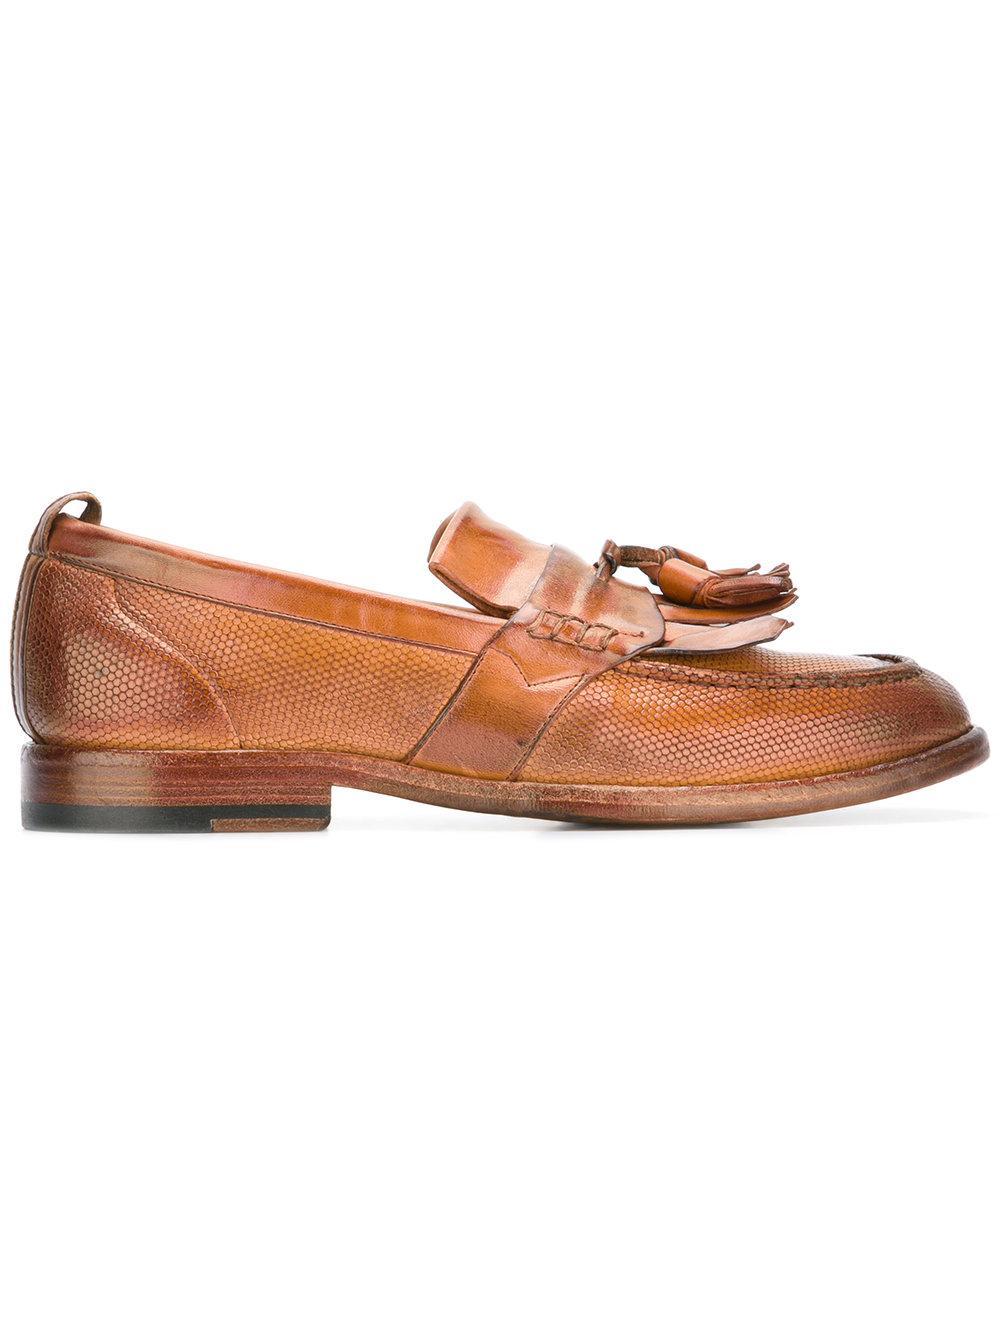 Sartori Gold Womens Shoes